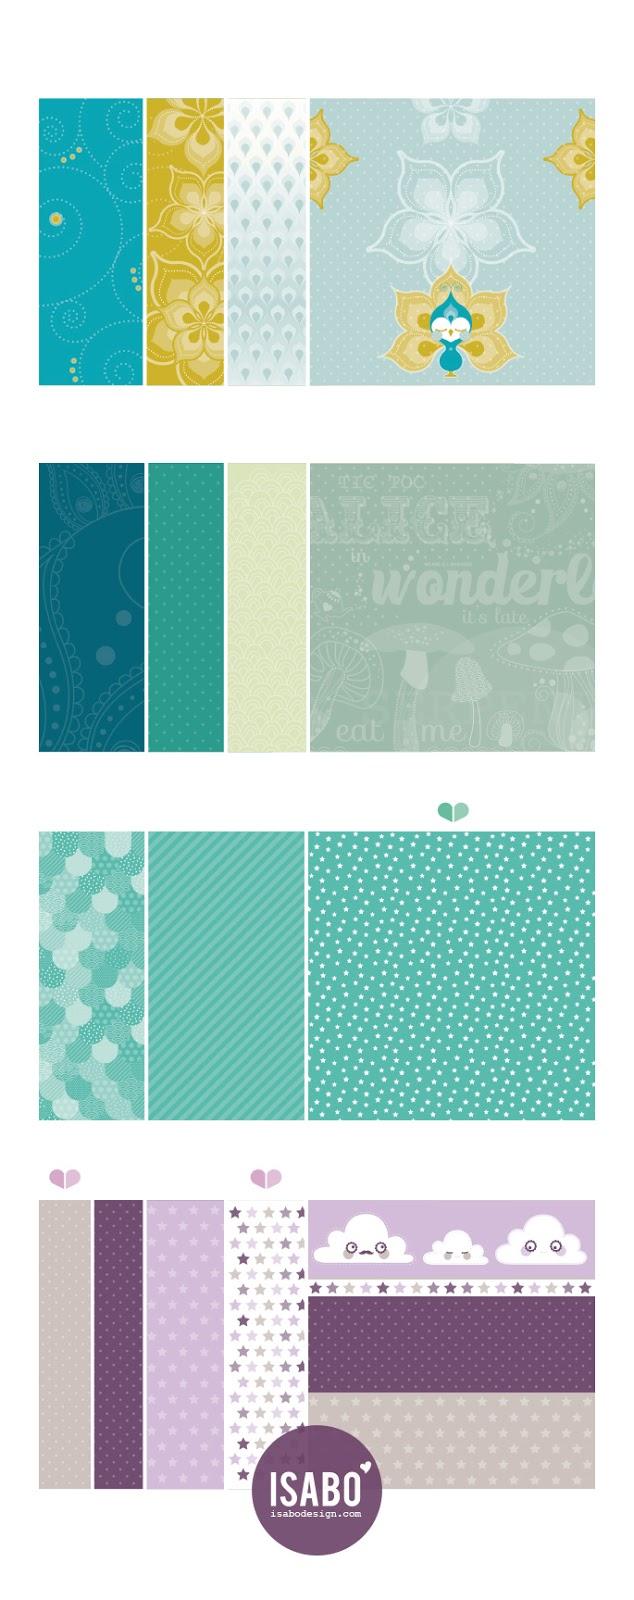 isabo-hobby-di-carta-scrapbooking-paper-design